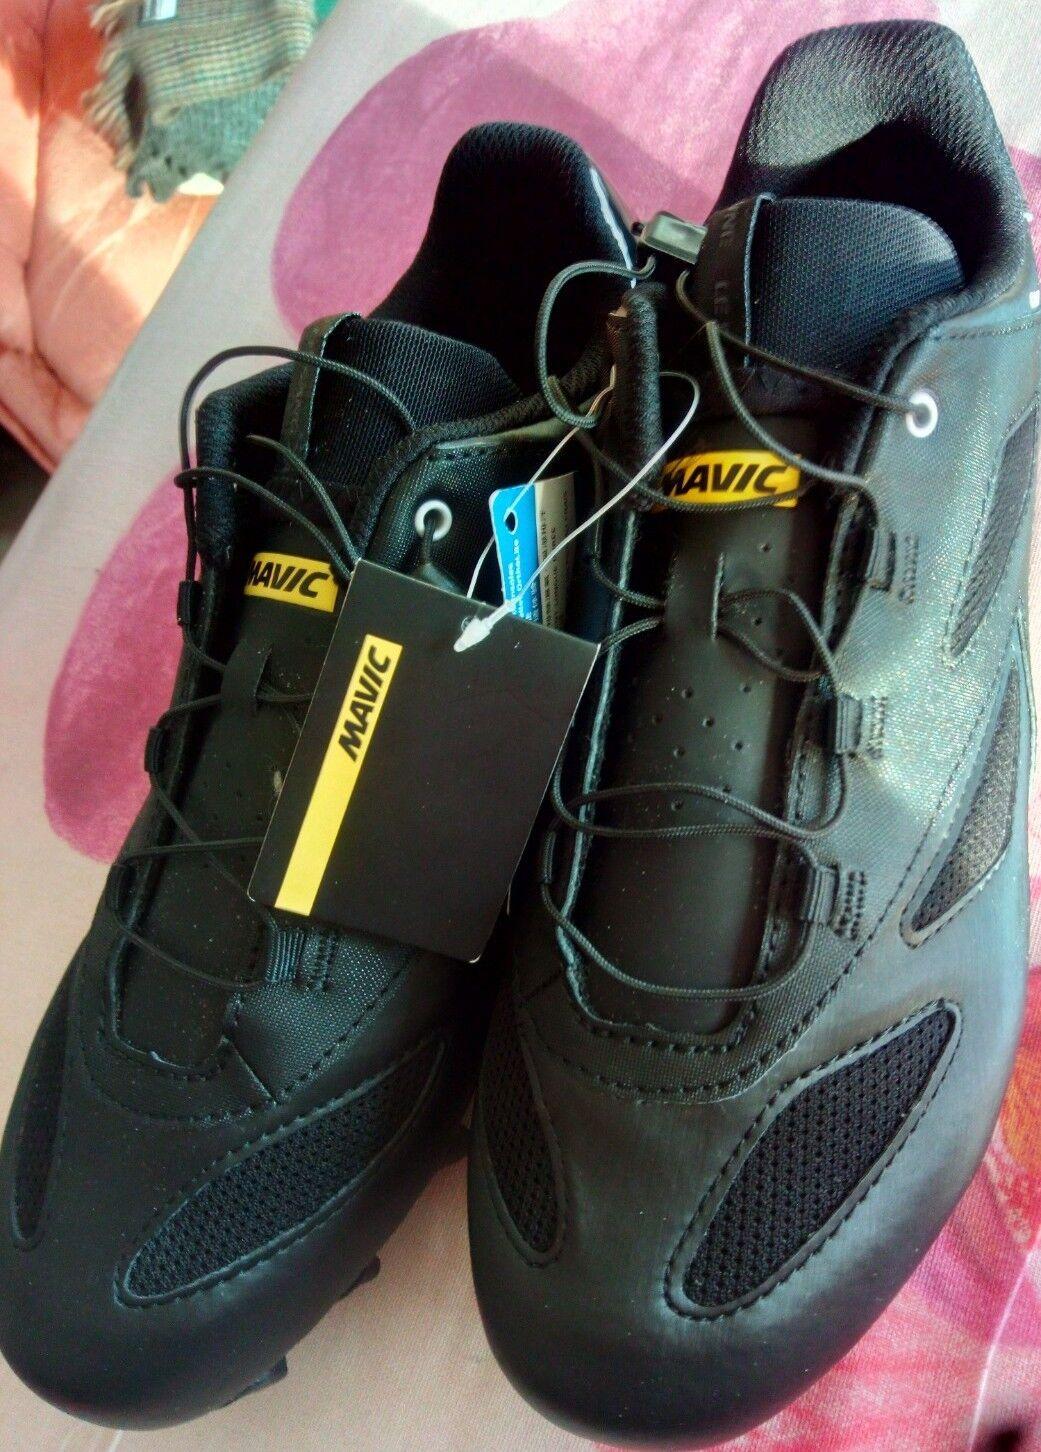 Neue Rennrad-Schuhe-MAVIC-CROSSMAX ( contagrip Ortholite) Gr.-42 Schwarz Farbe.